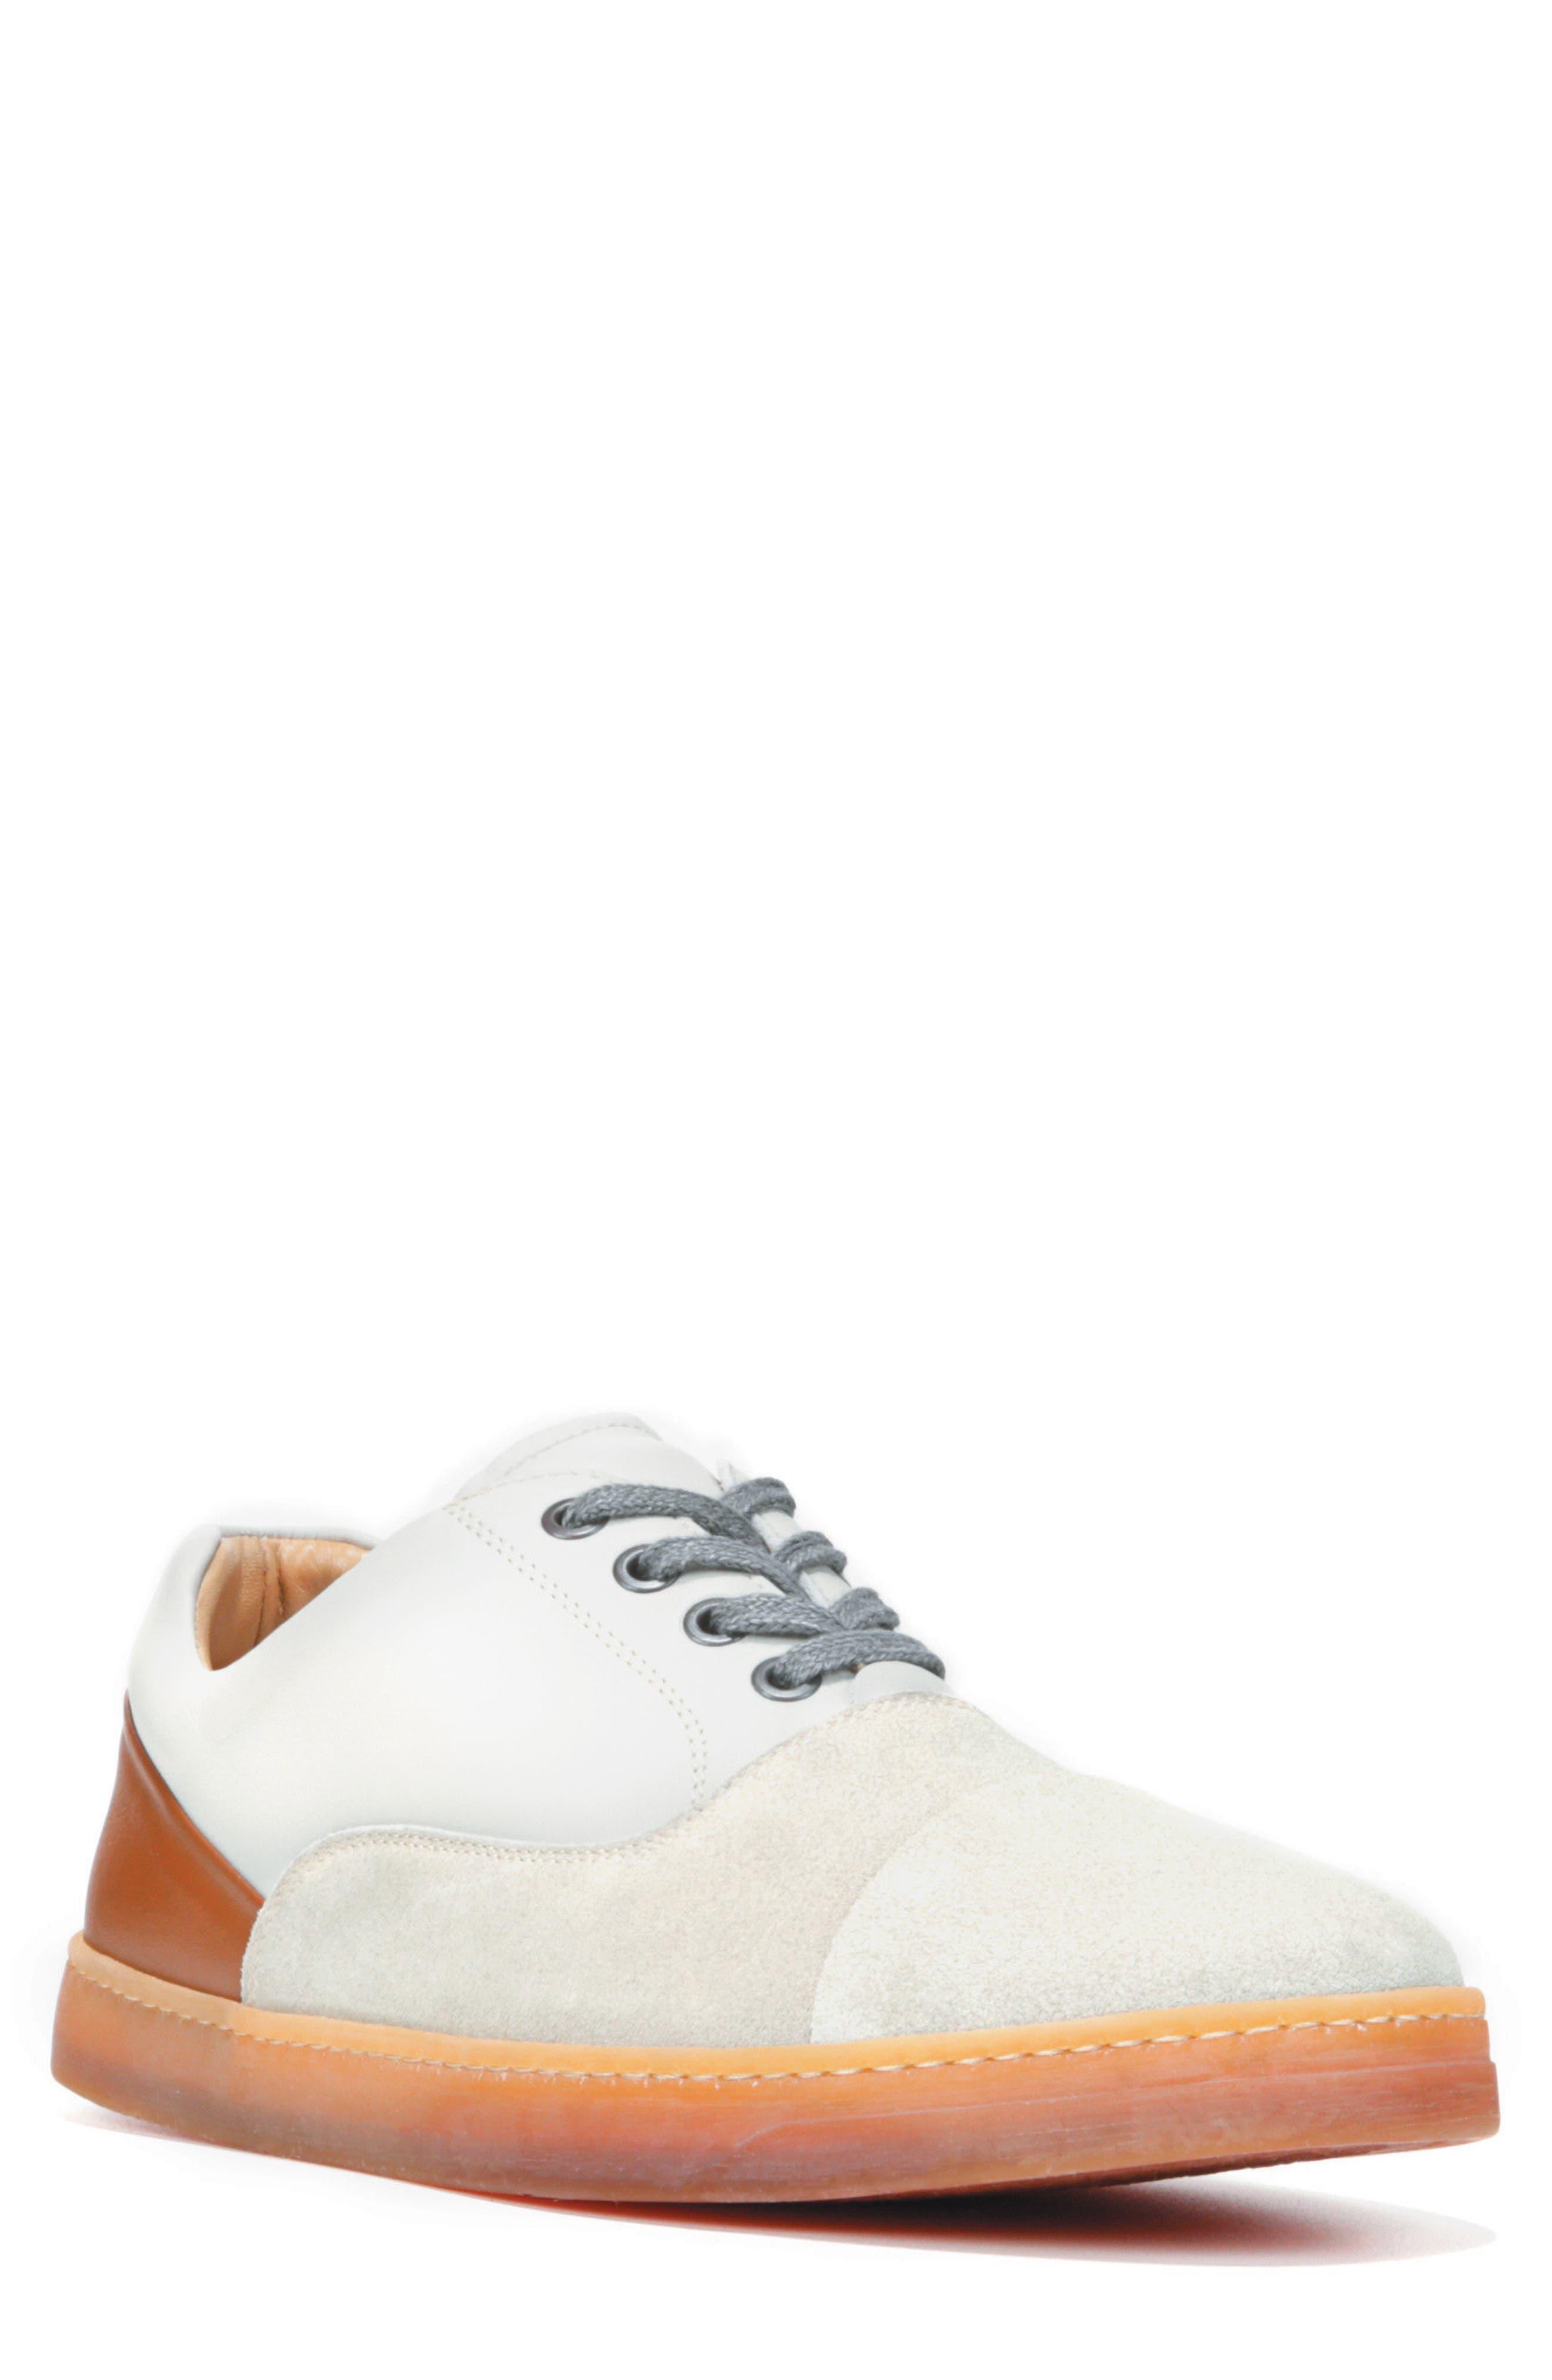 Baldwin Sneaker,                             Alternate thumbnail 4, color,